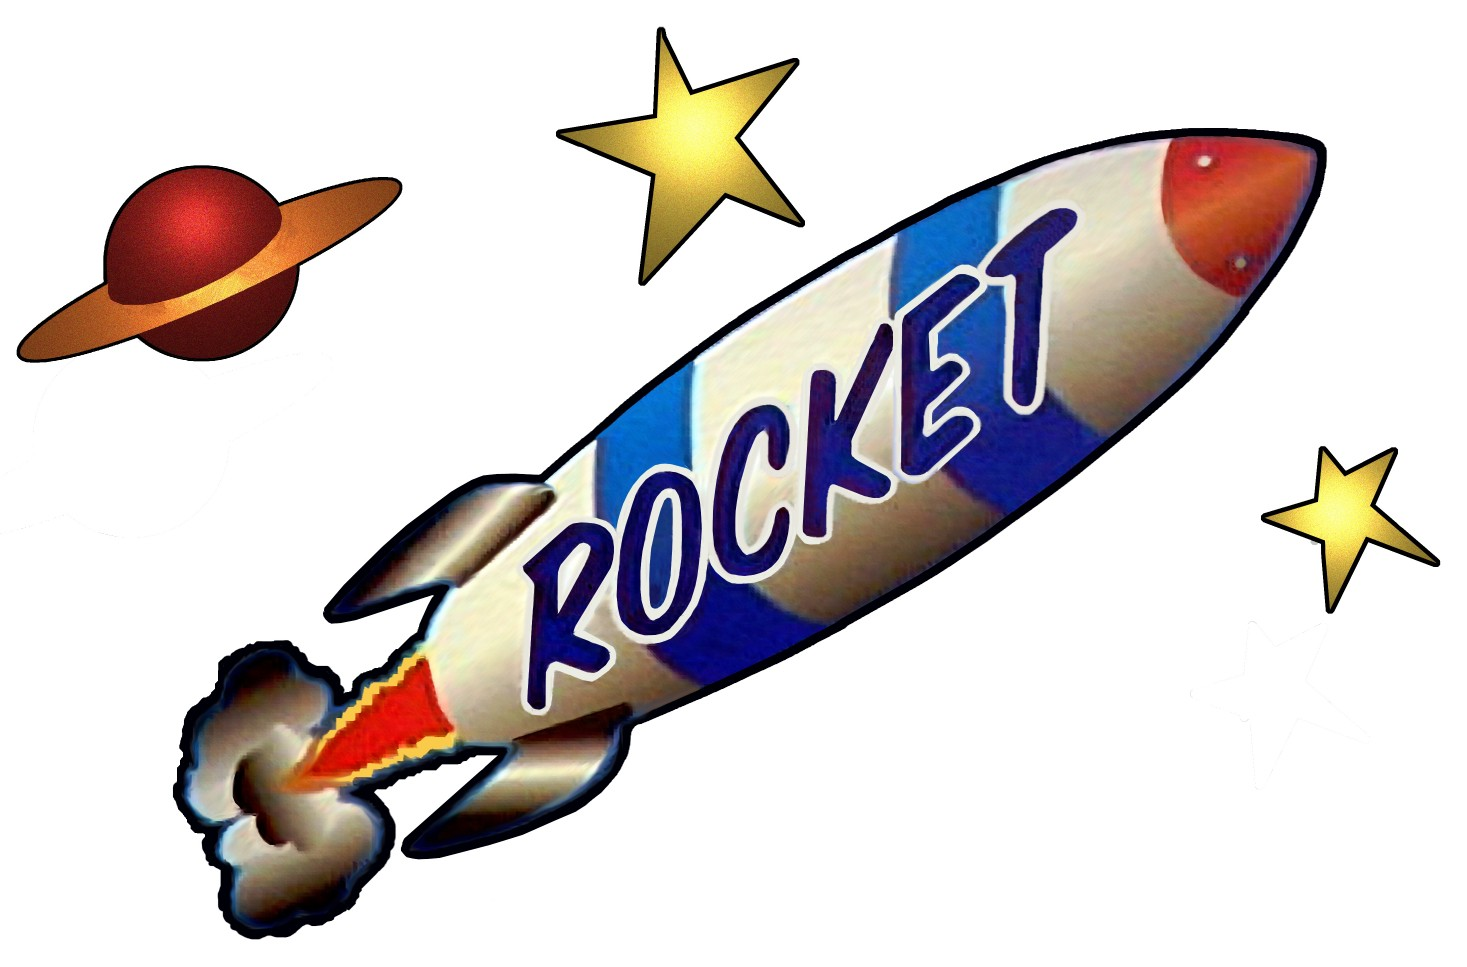 Mays lexa clip art. Clipart rocket rocket math